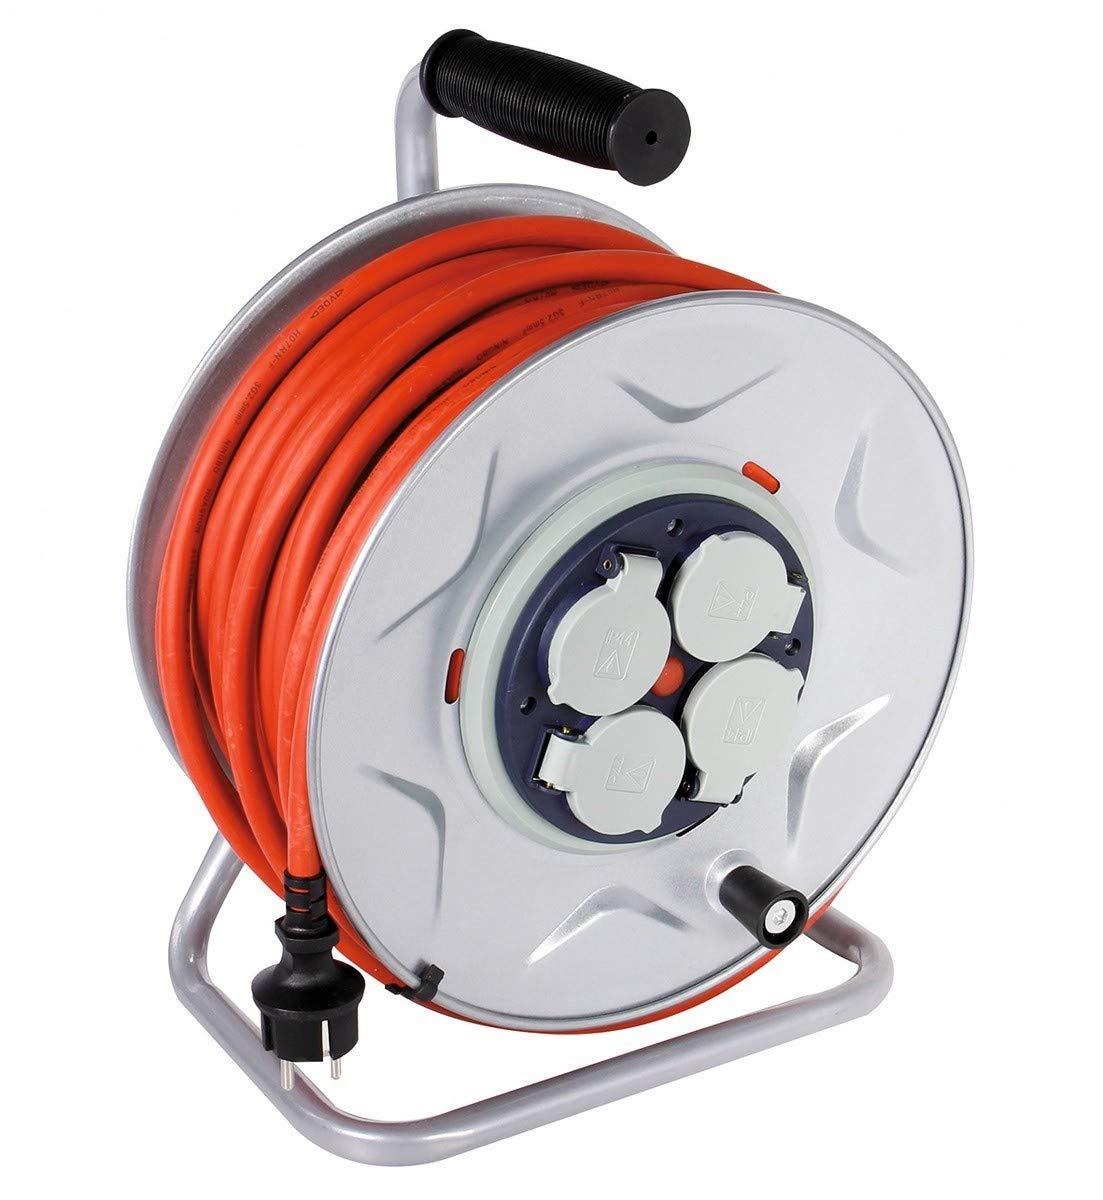 HO7 RN-F 3G 2,5 mm/² Enrouleur professionnel moyeu fixe Dhome Longueur 25 m